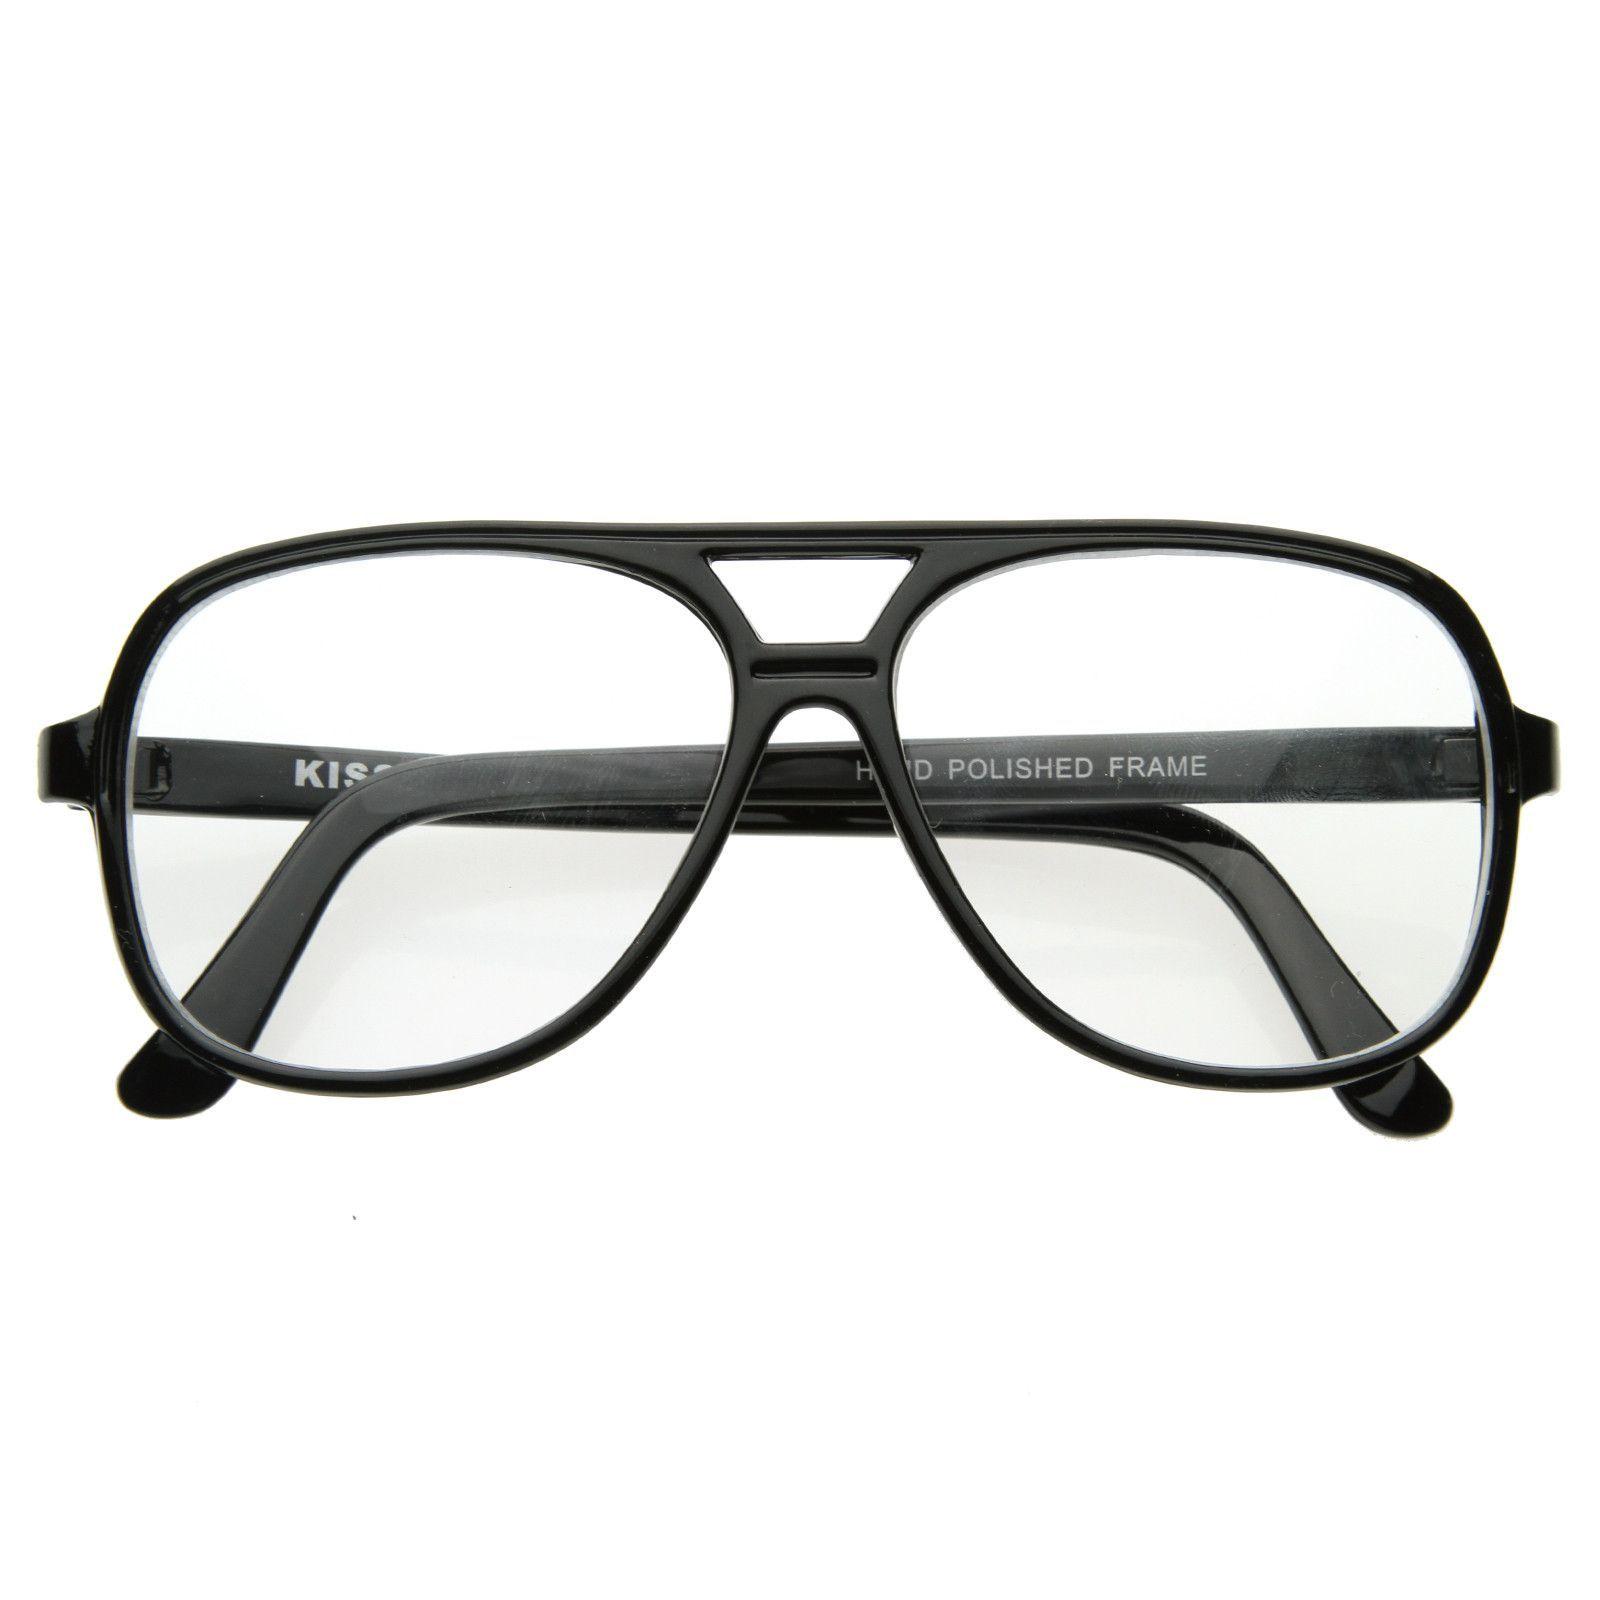 Retro 1980's Basic Square Aviator Clear Lens Glasses 8043